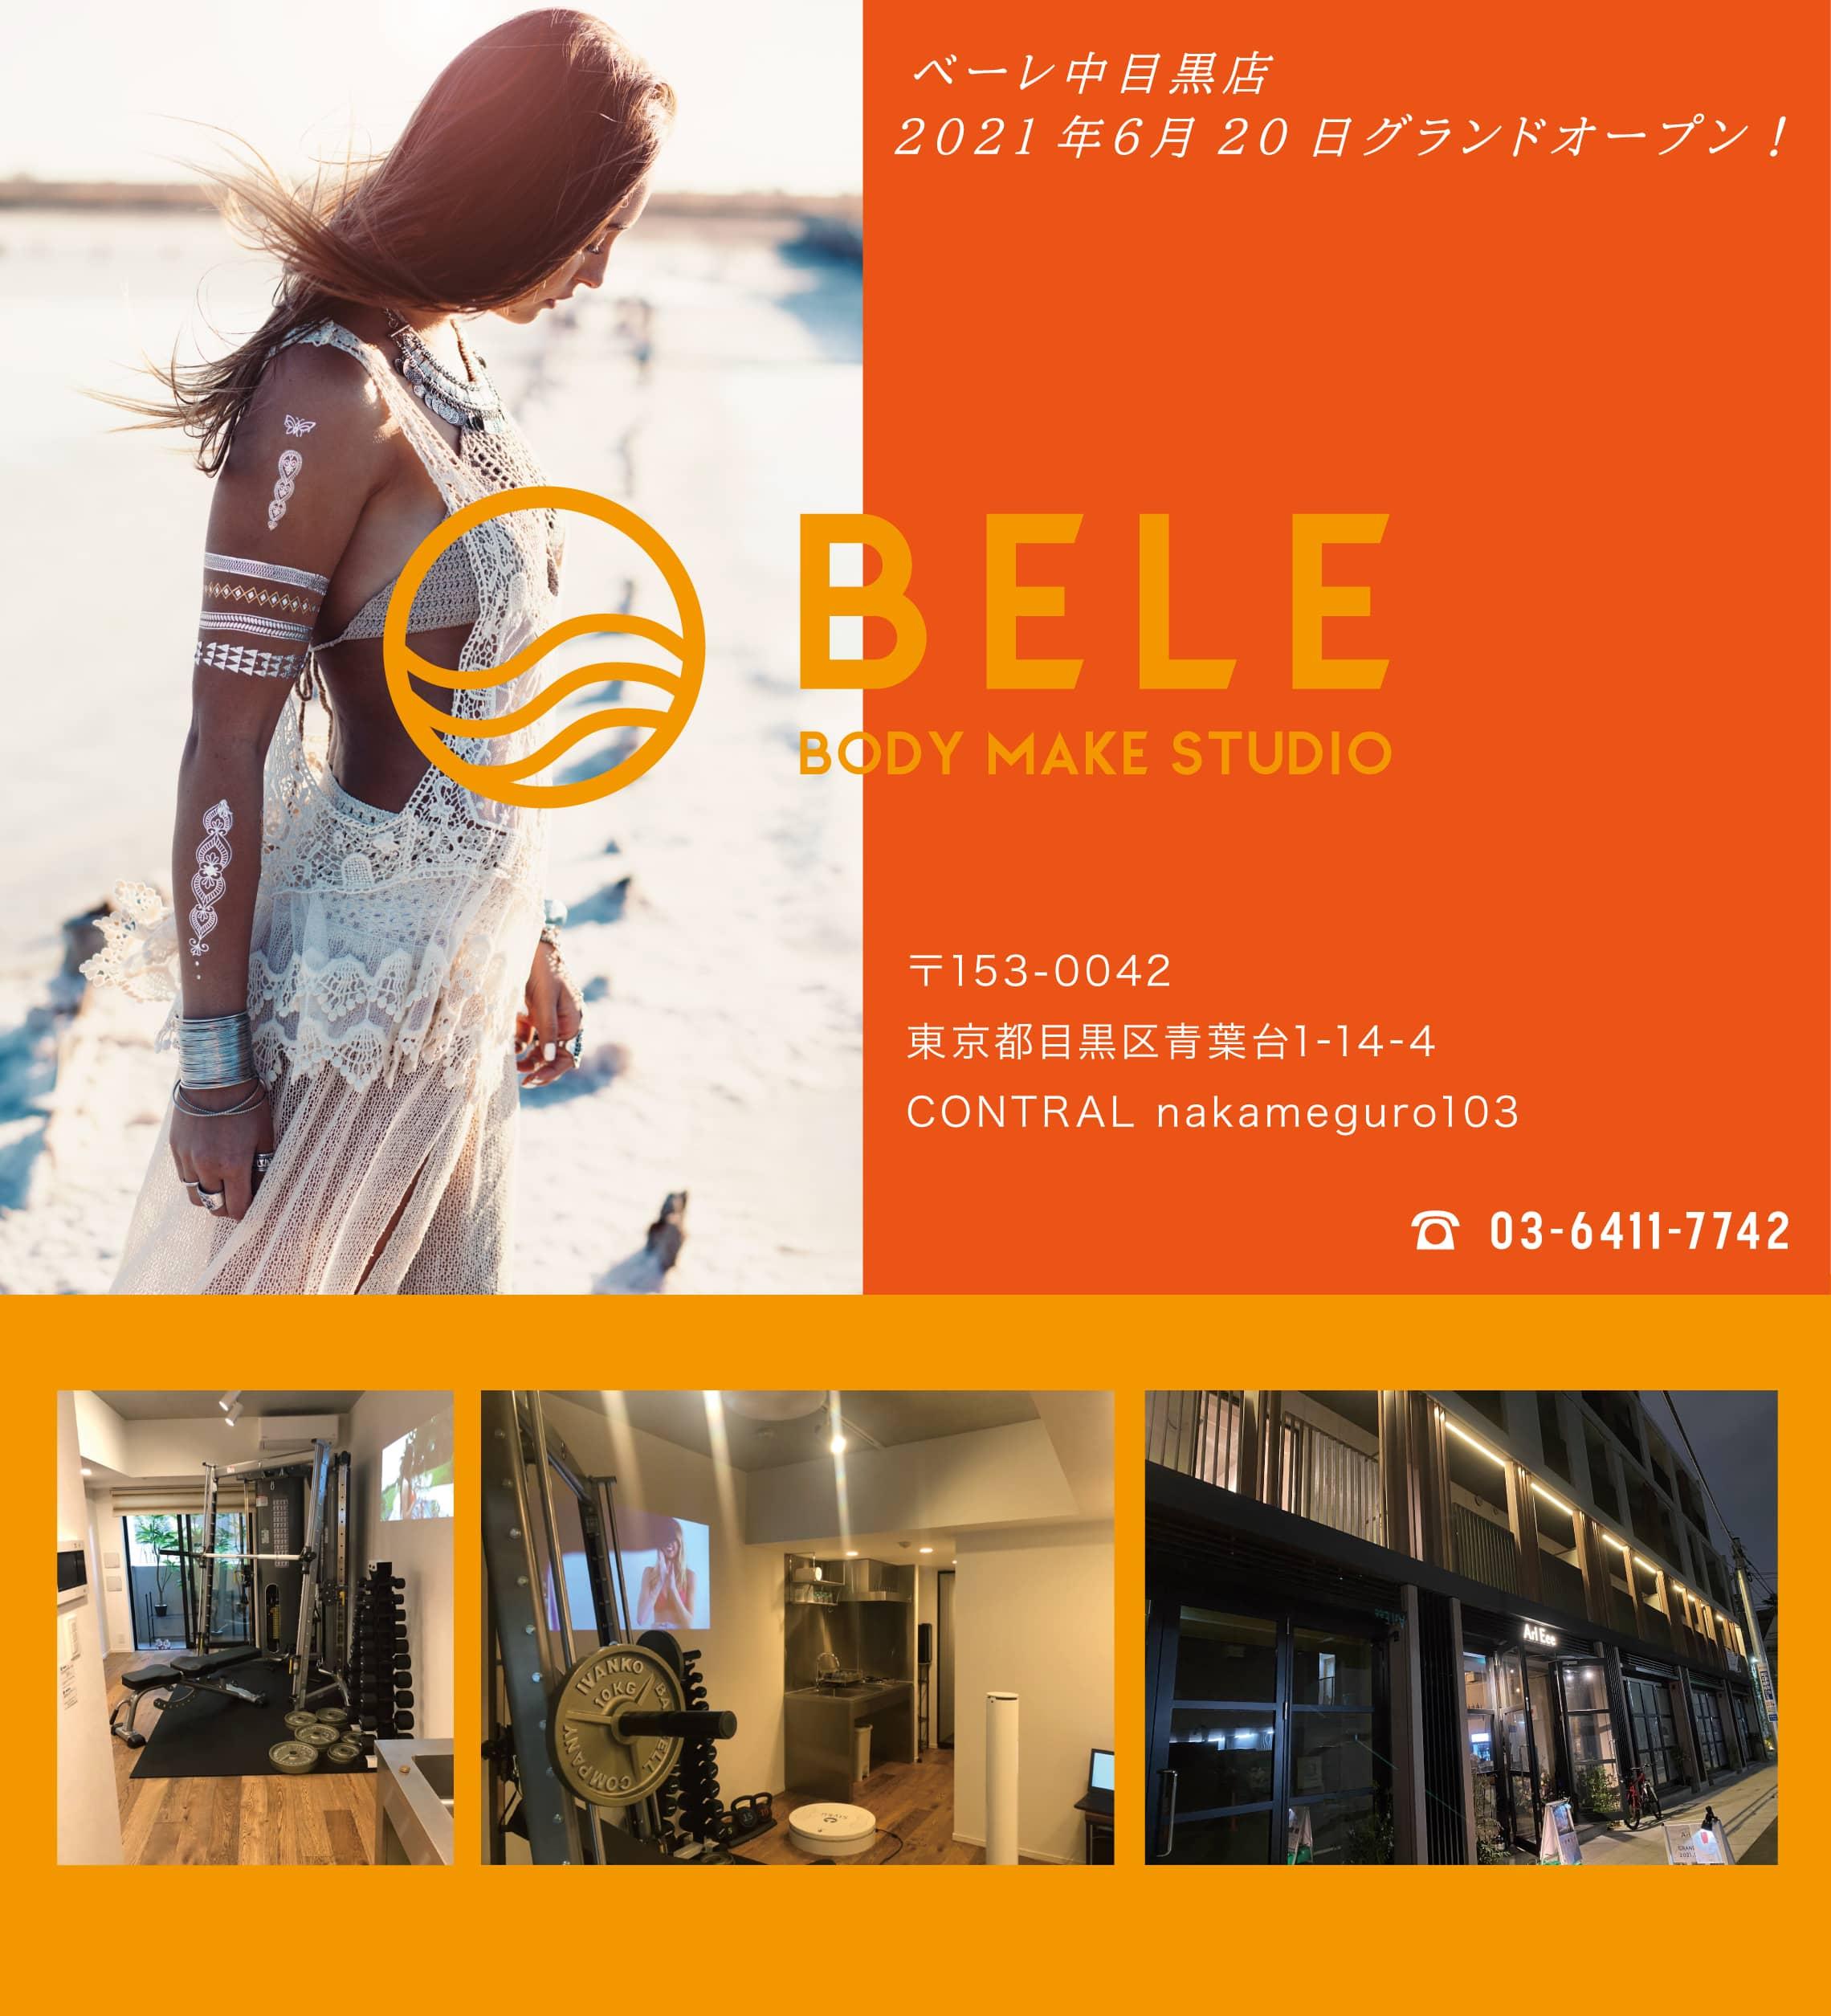 6/20 BELE中目黒店オープン!! 画像